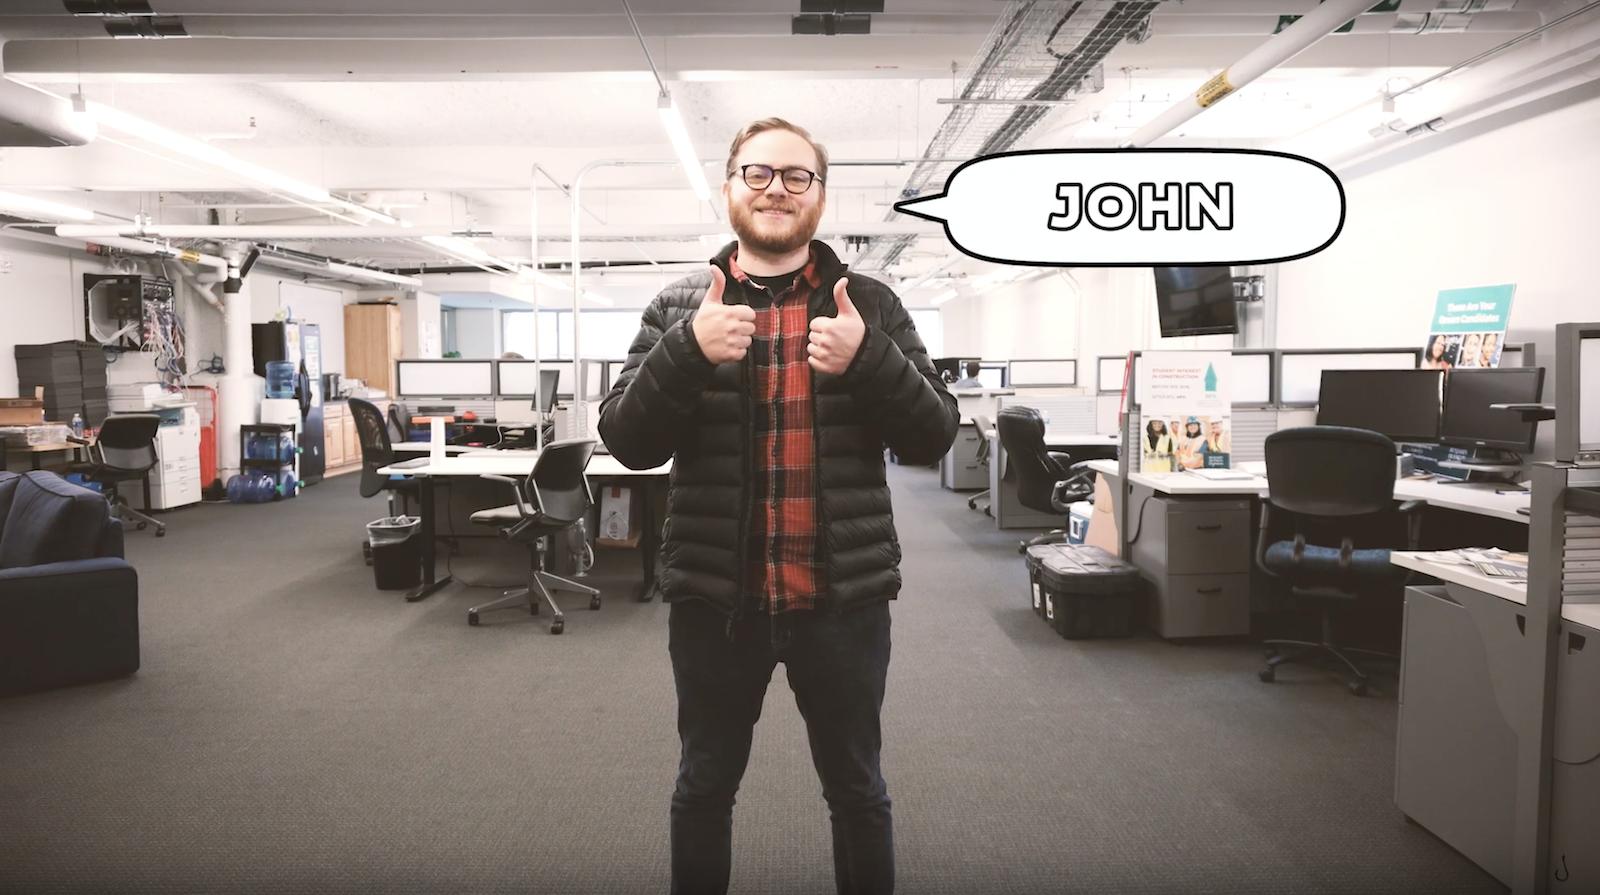 john receiving a phishing test